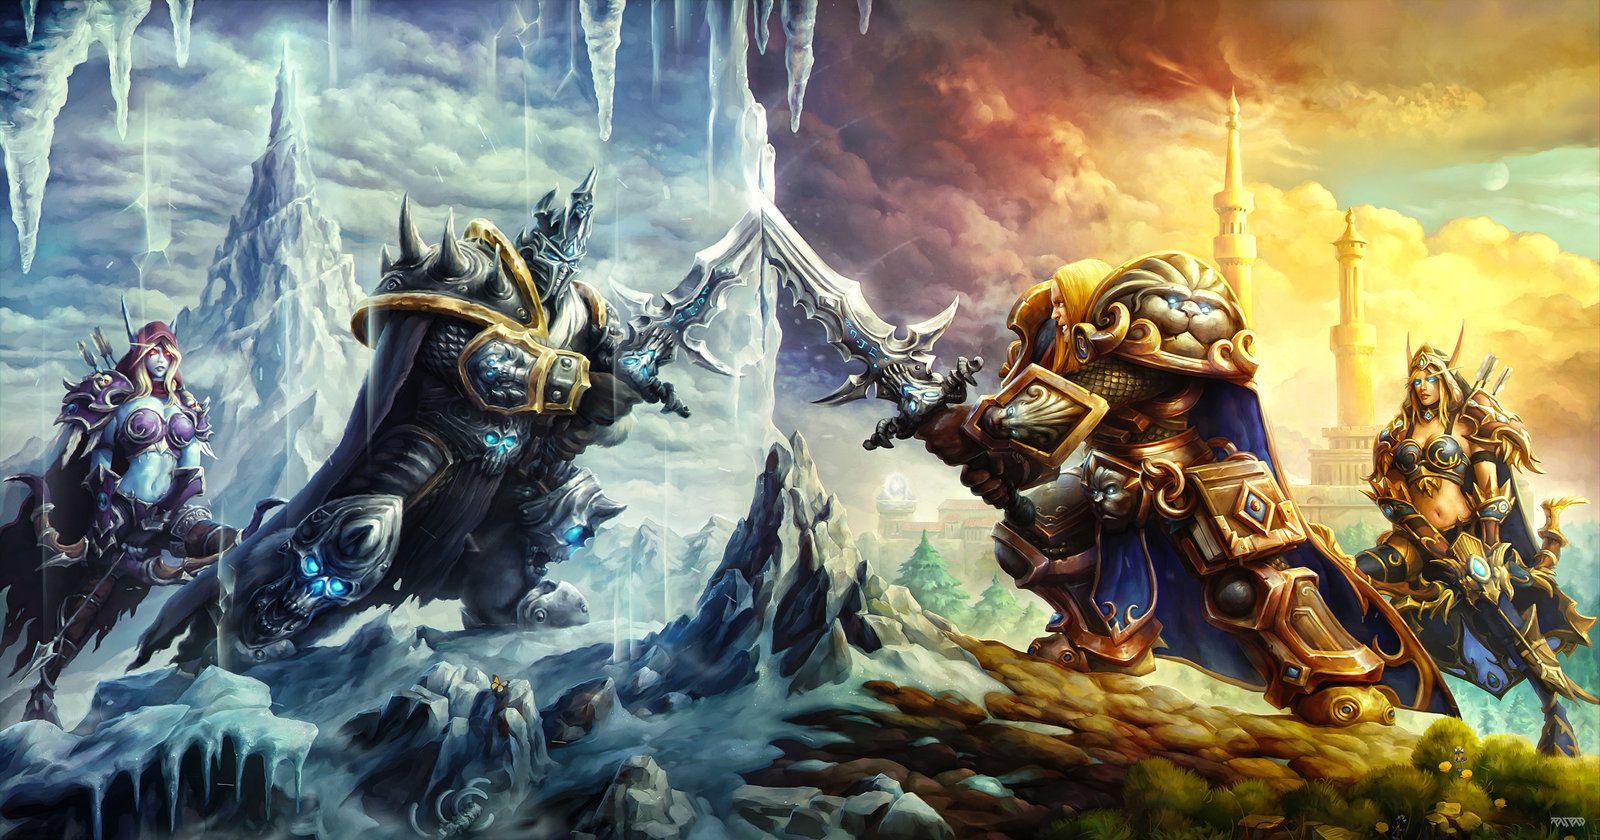 Battle Of Prince Arthas World Of Warcraft Heroes Of The Storm Warcraft Последние твиты от hots logs (@hotslogs). battle of prince arthas world of